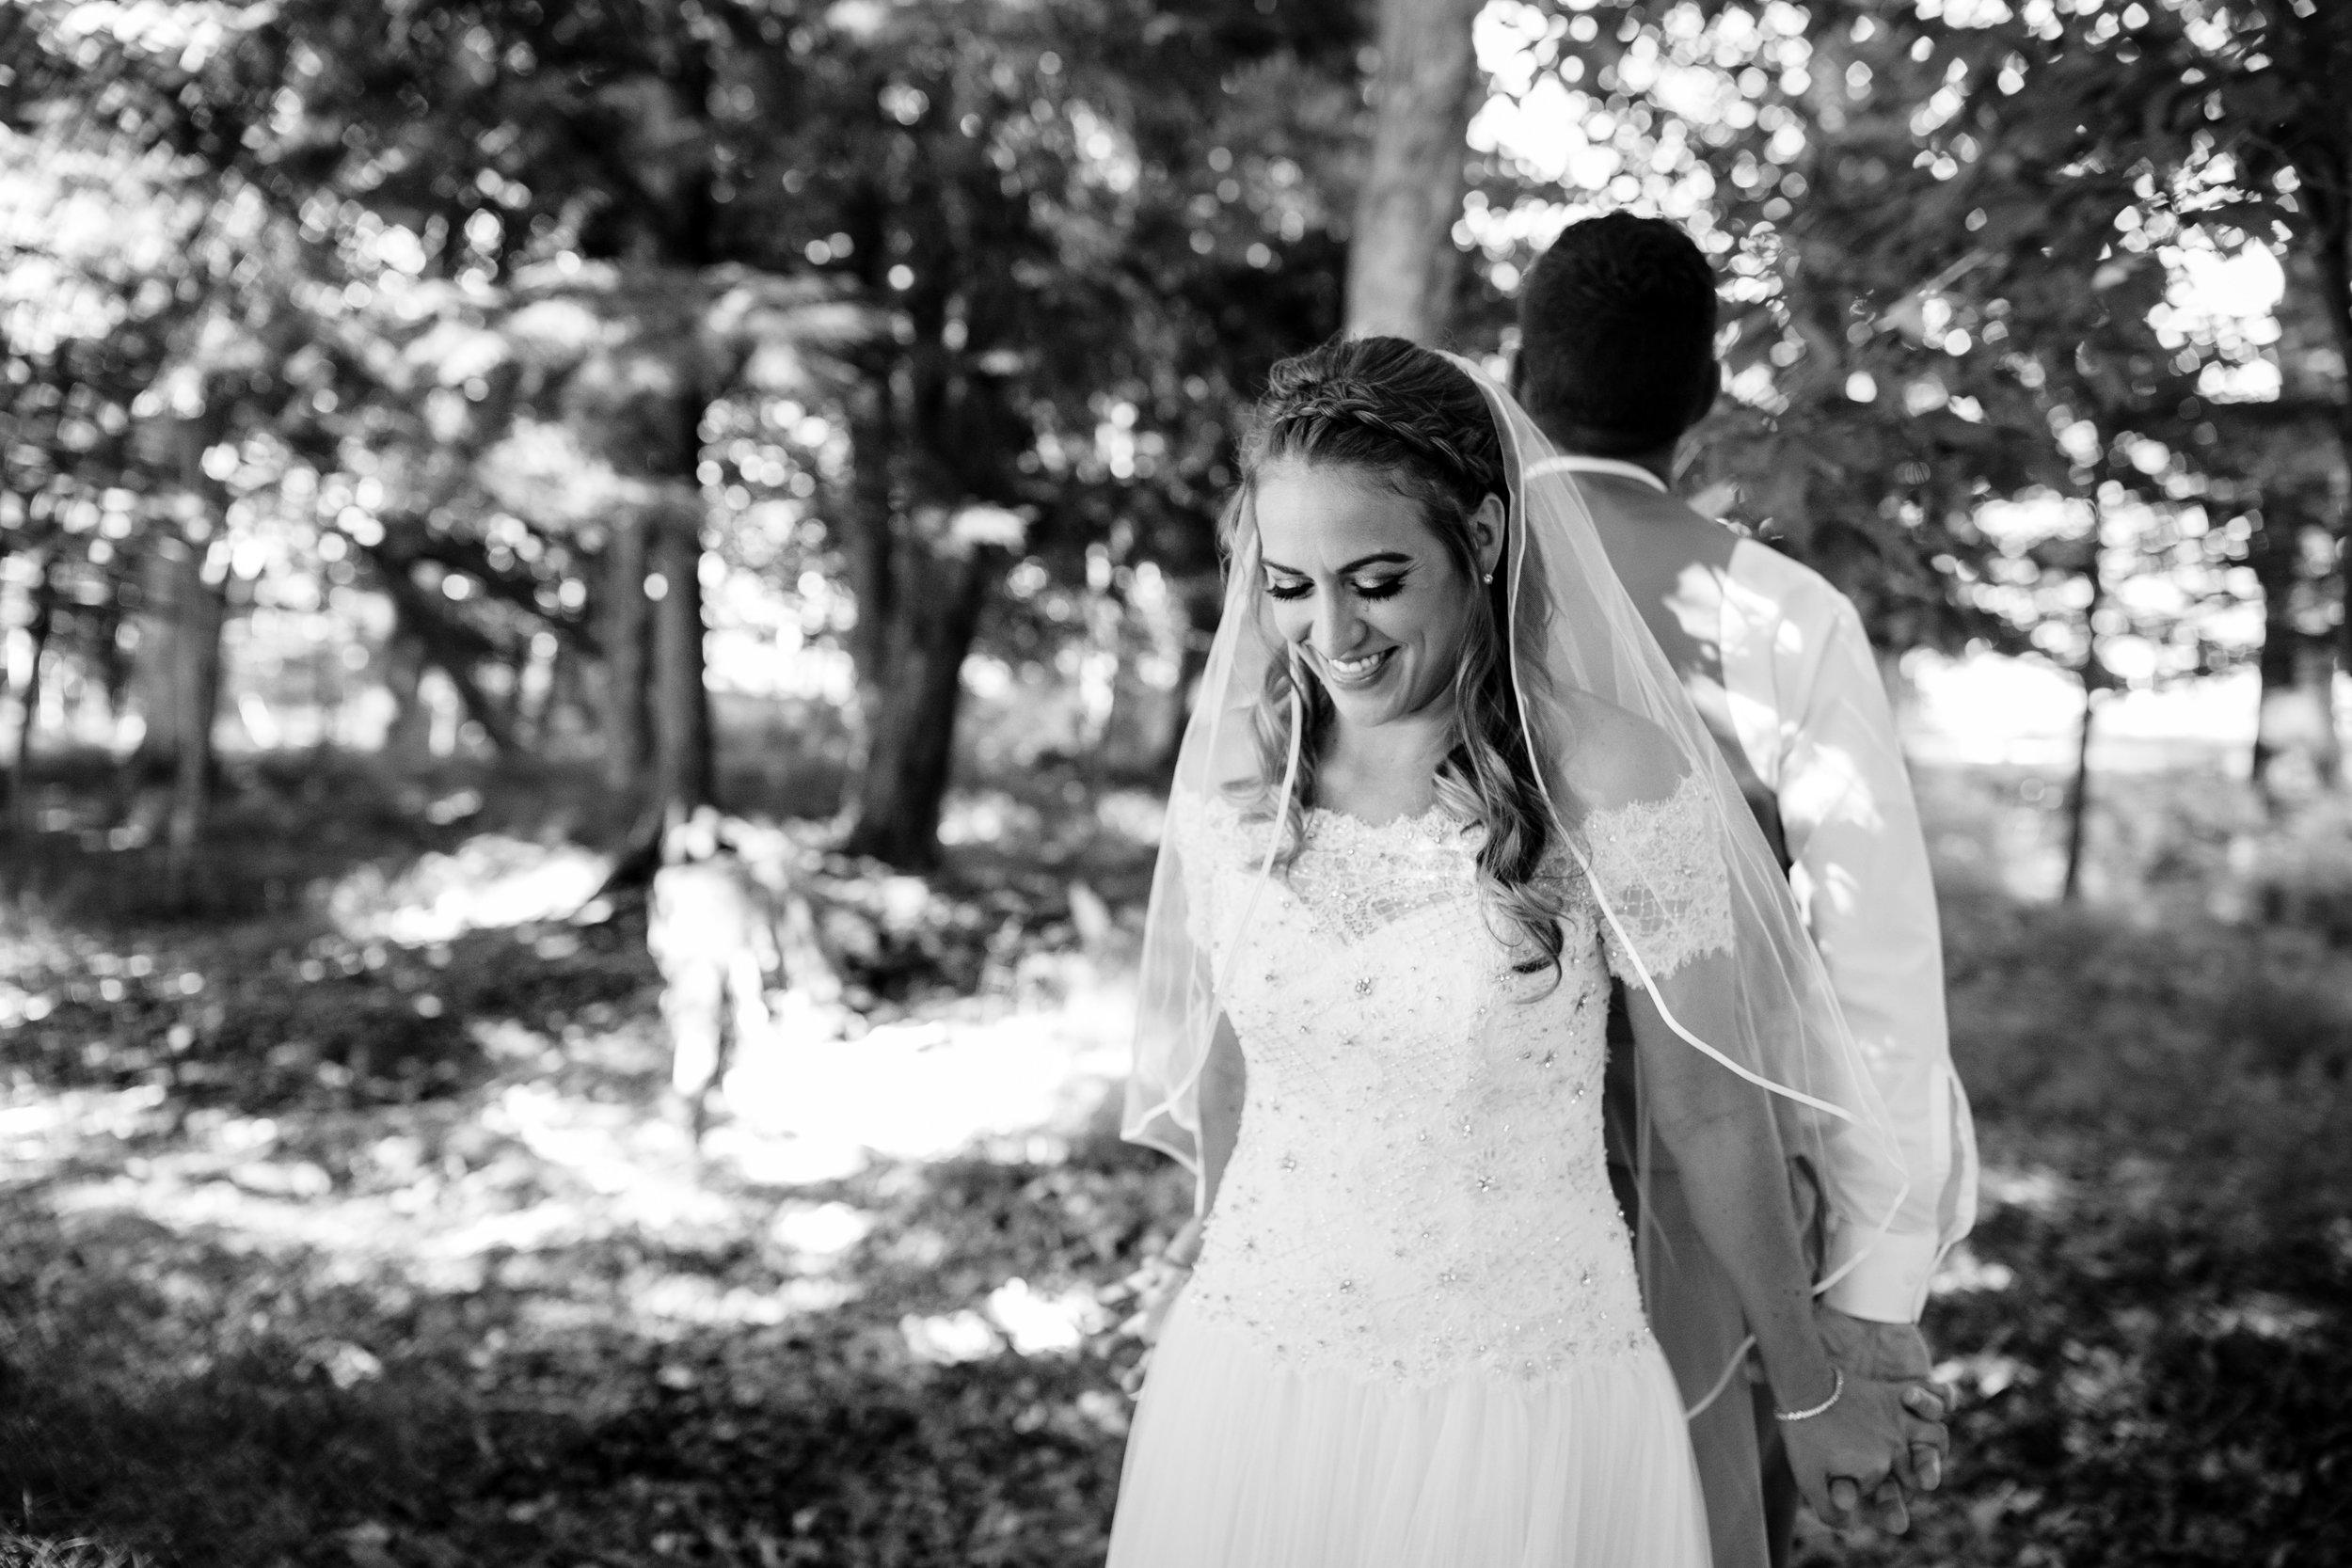 ludington-michigan-intimate-backyard-wedding-jessica-nolan84.jpg